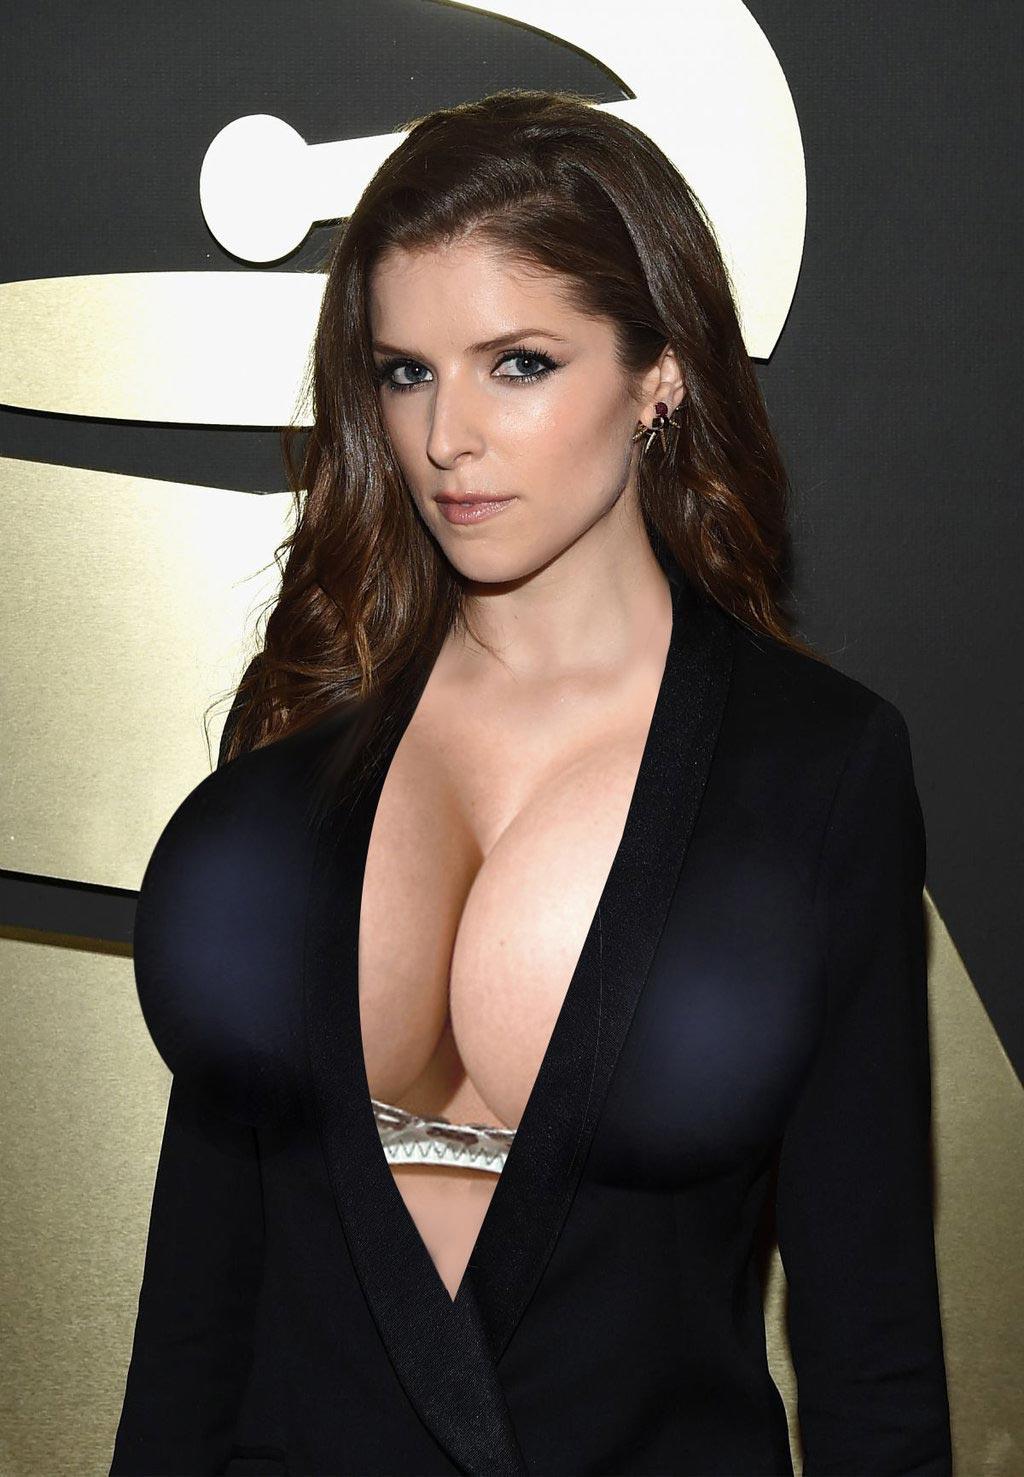 anna kendrick boobs naked